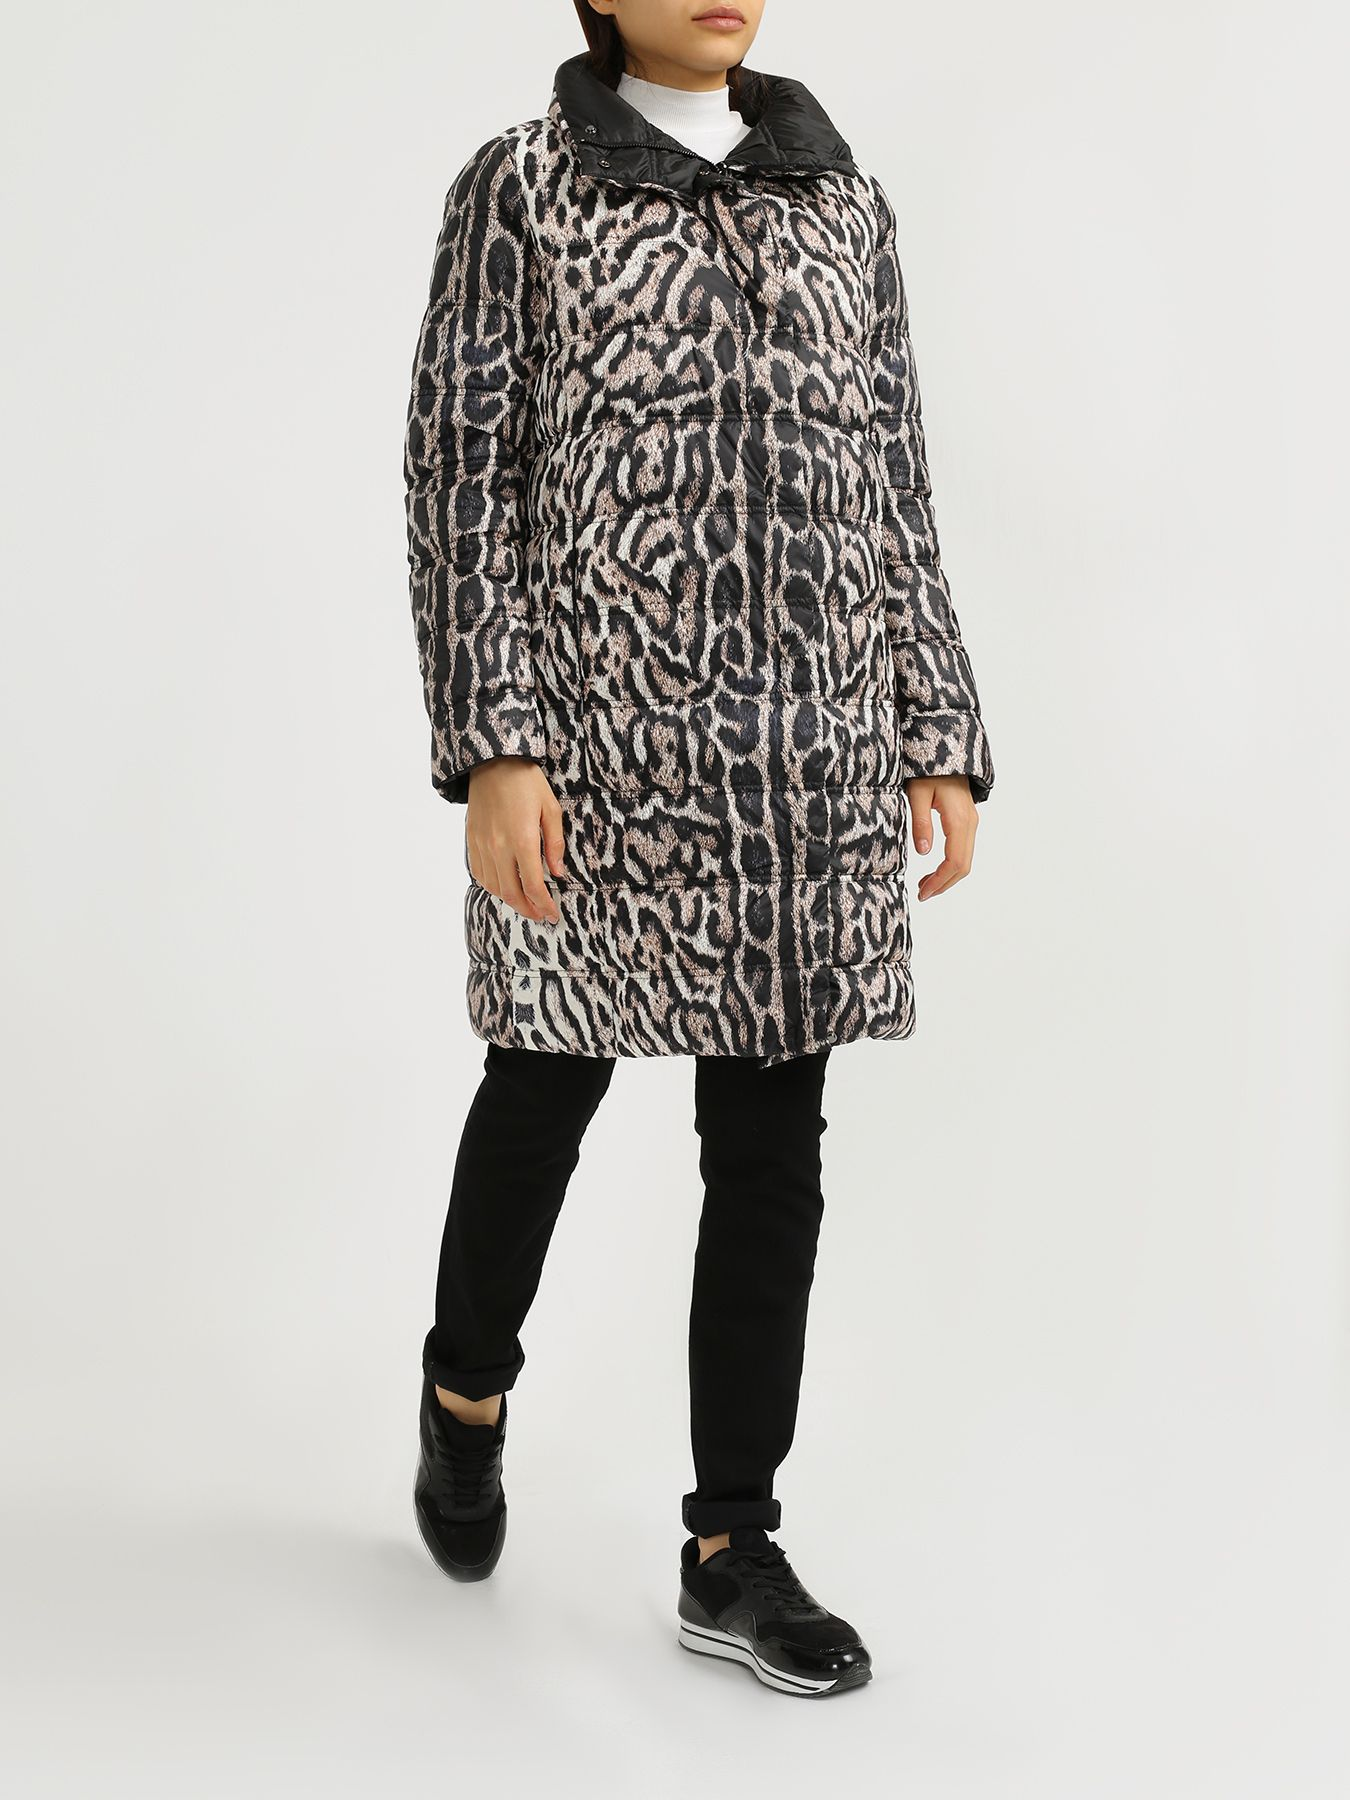 Полупальто ORSA Couture Двустороннее полупальто полупальто milana style